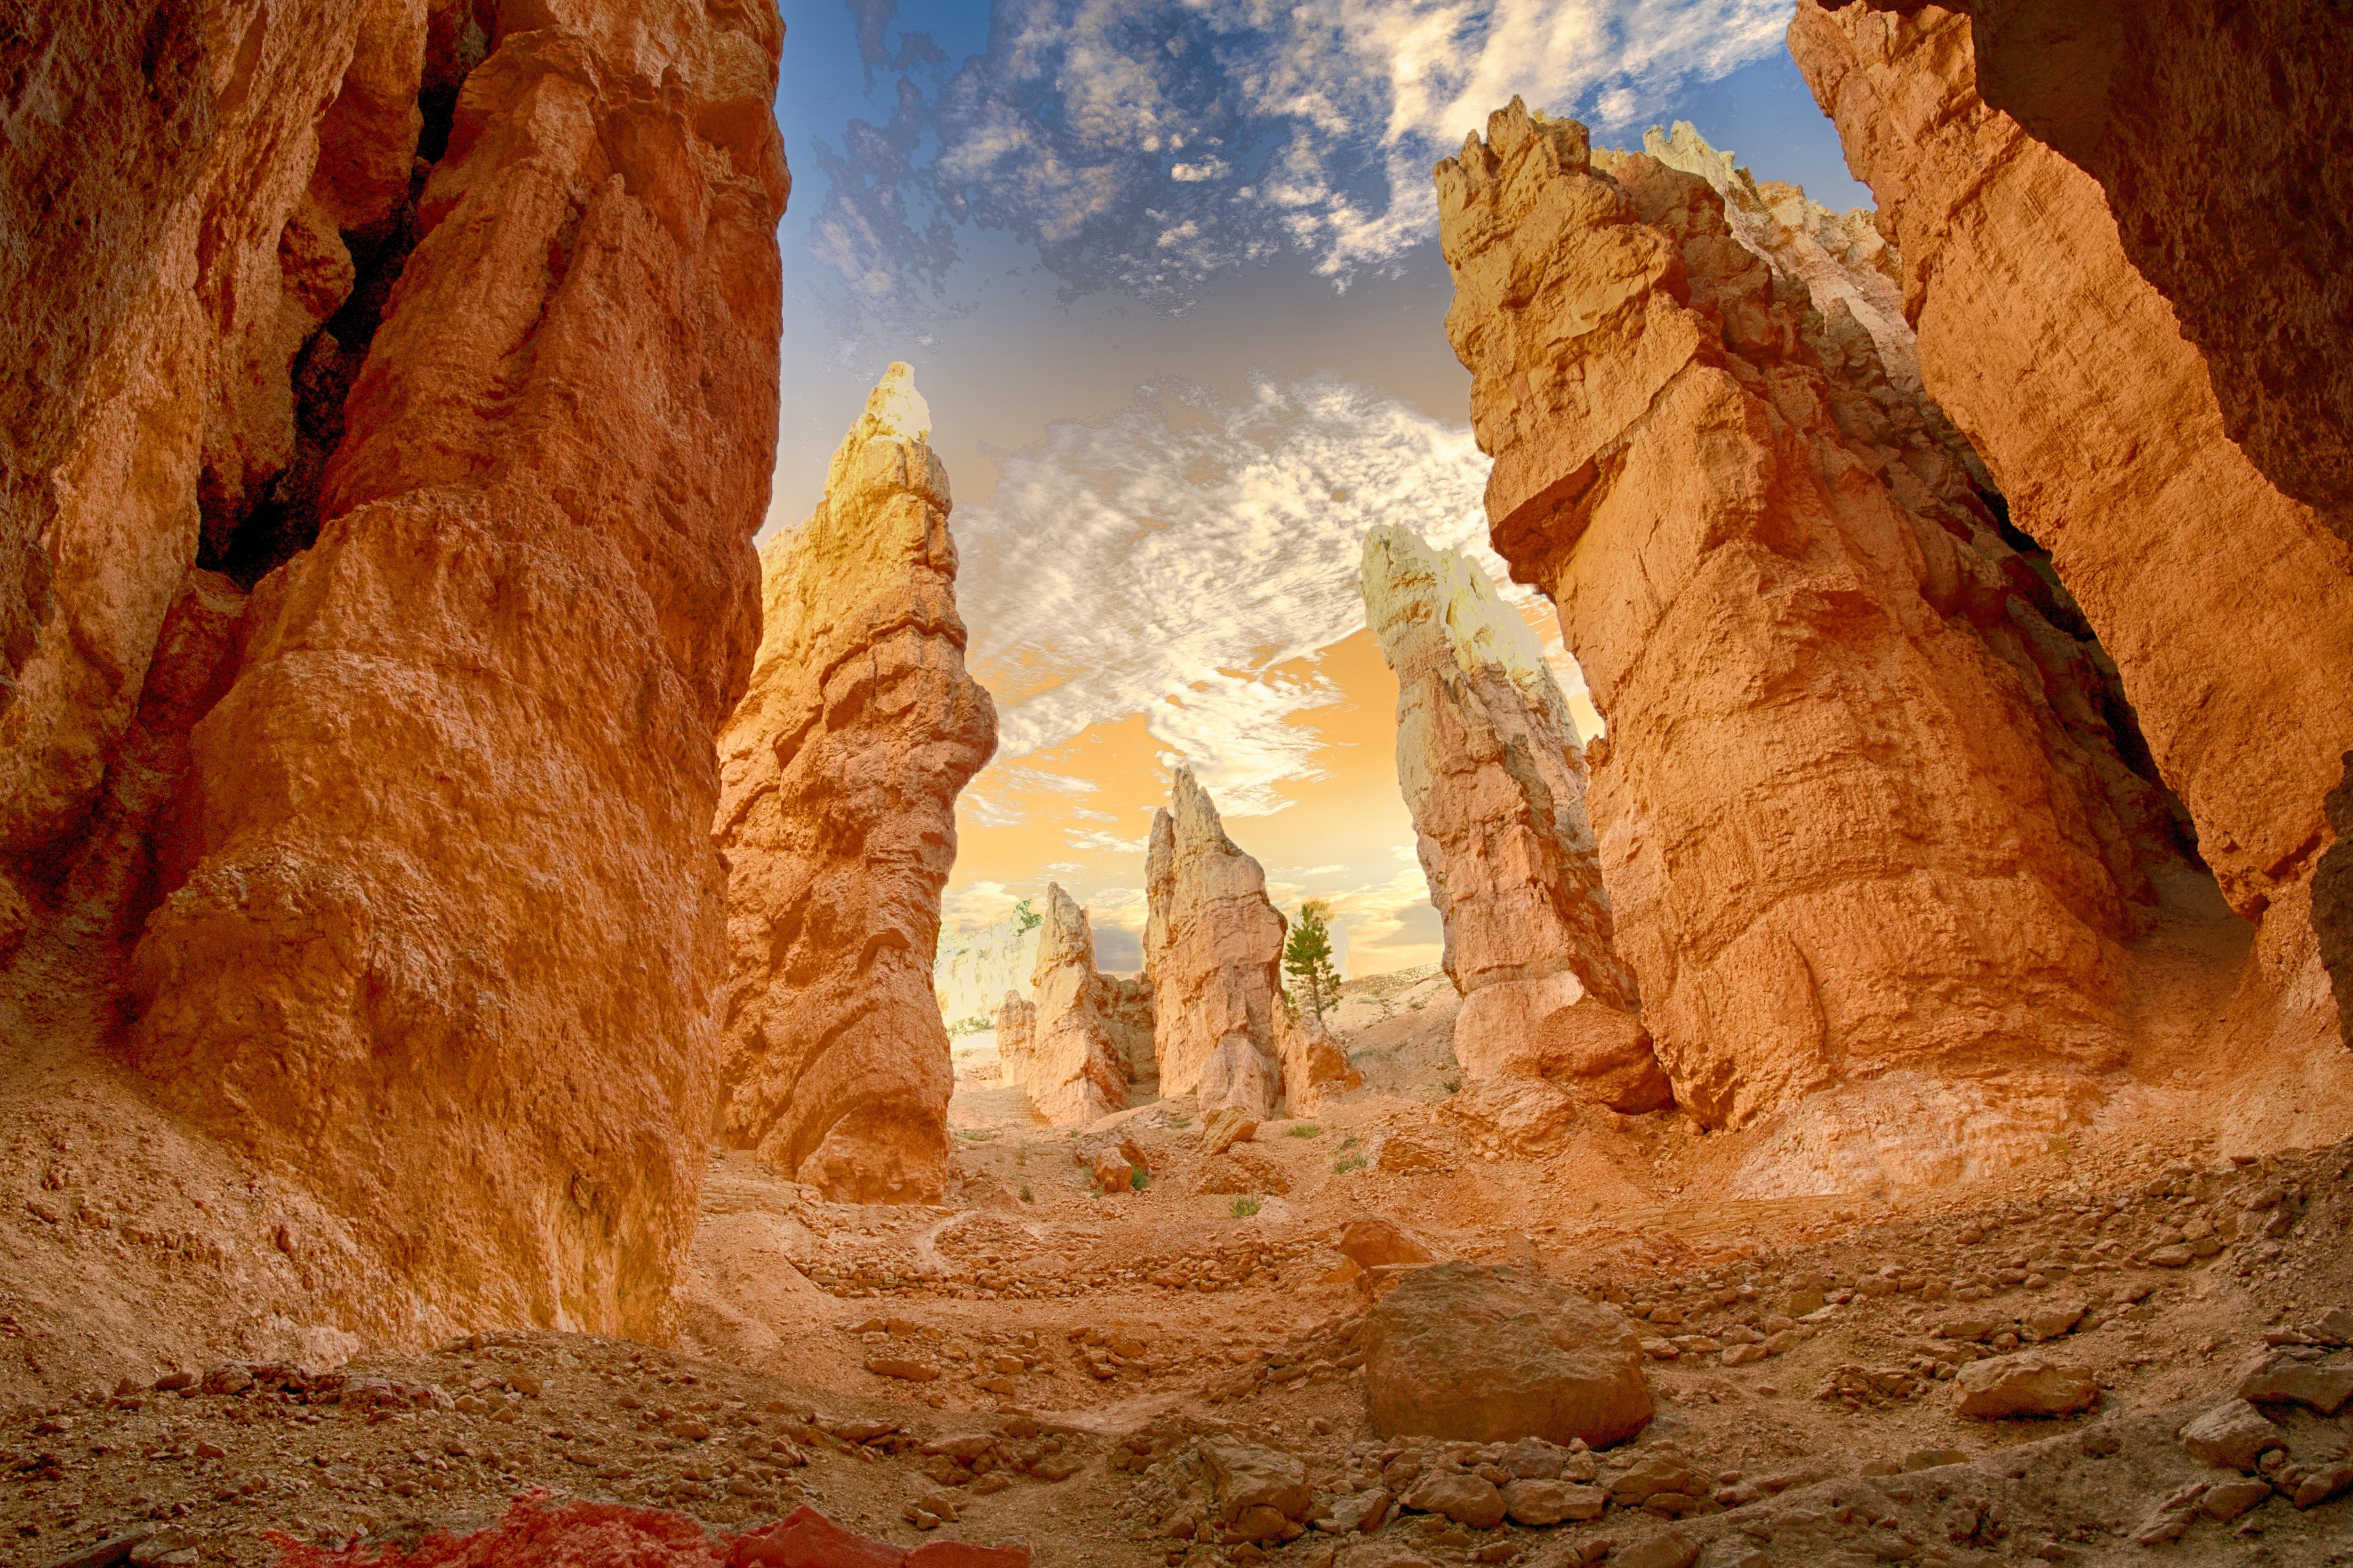 canyon-cliff-desert-414110.jpg